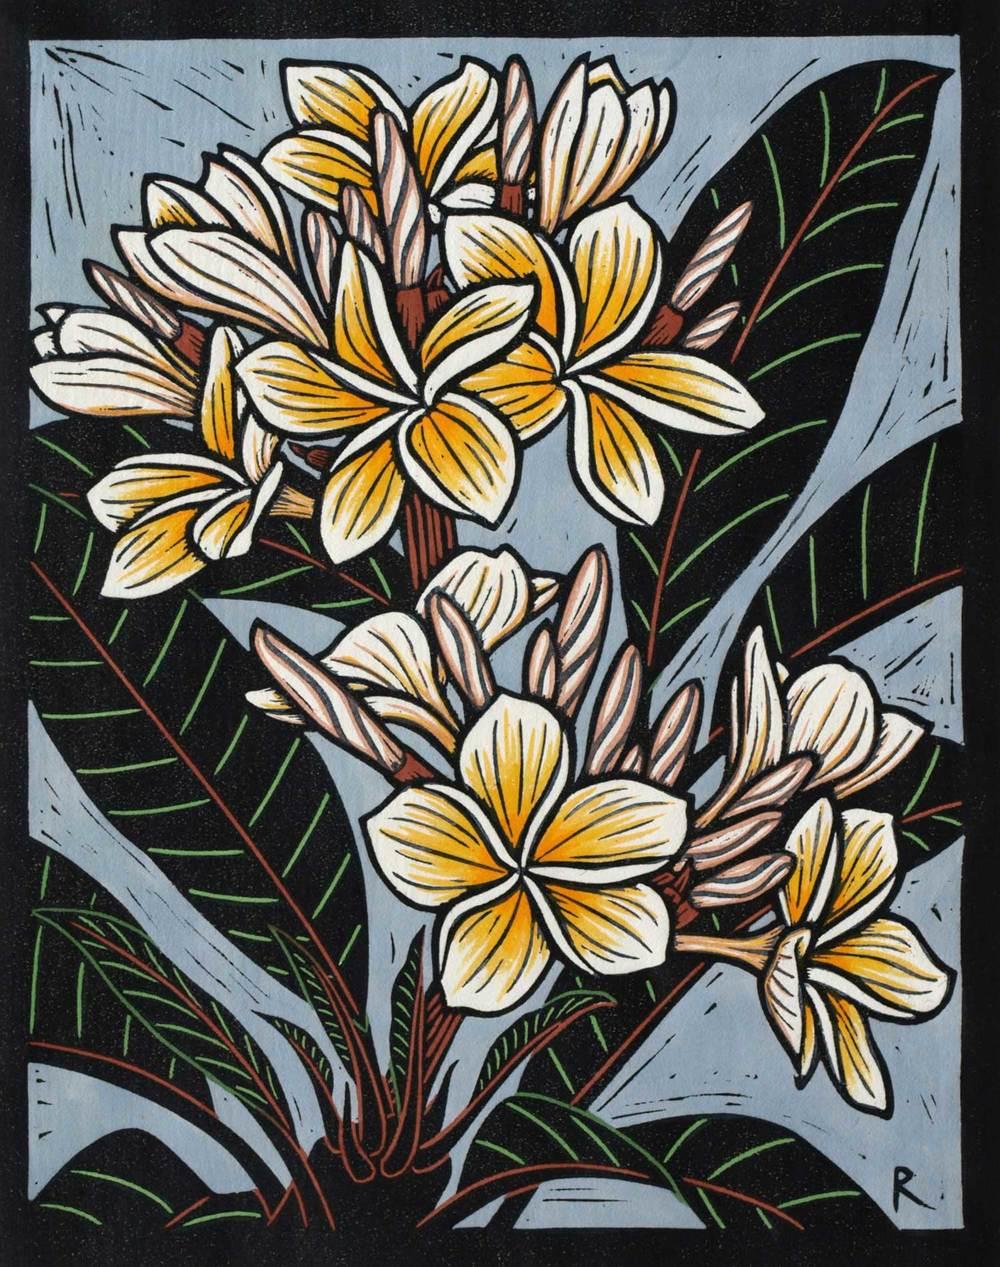 frangipani-2-linocut-rachel-newling.jpg